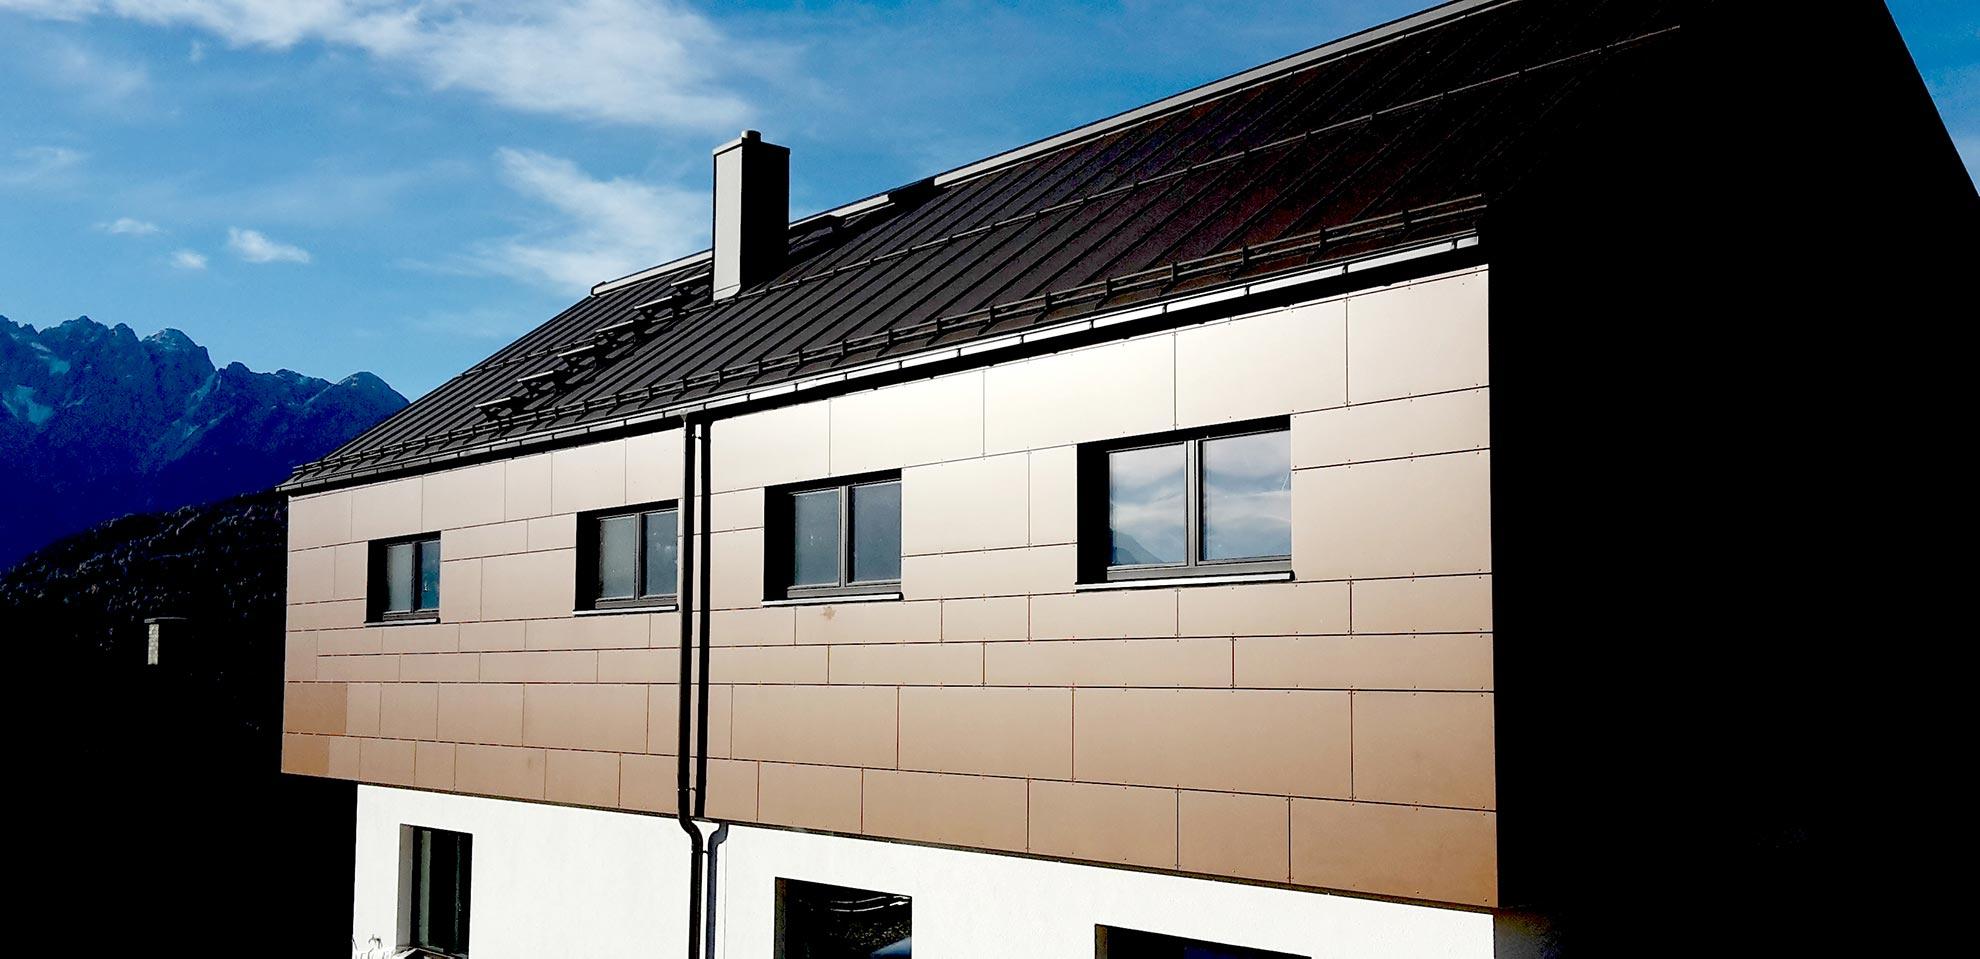 Private-house.-Thum-Austria.-Corten-steel-2-WOOD-Ahorn_02_1592990664.jpg